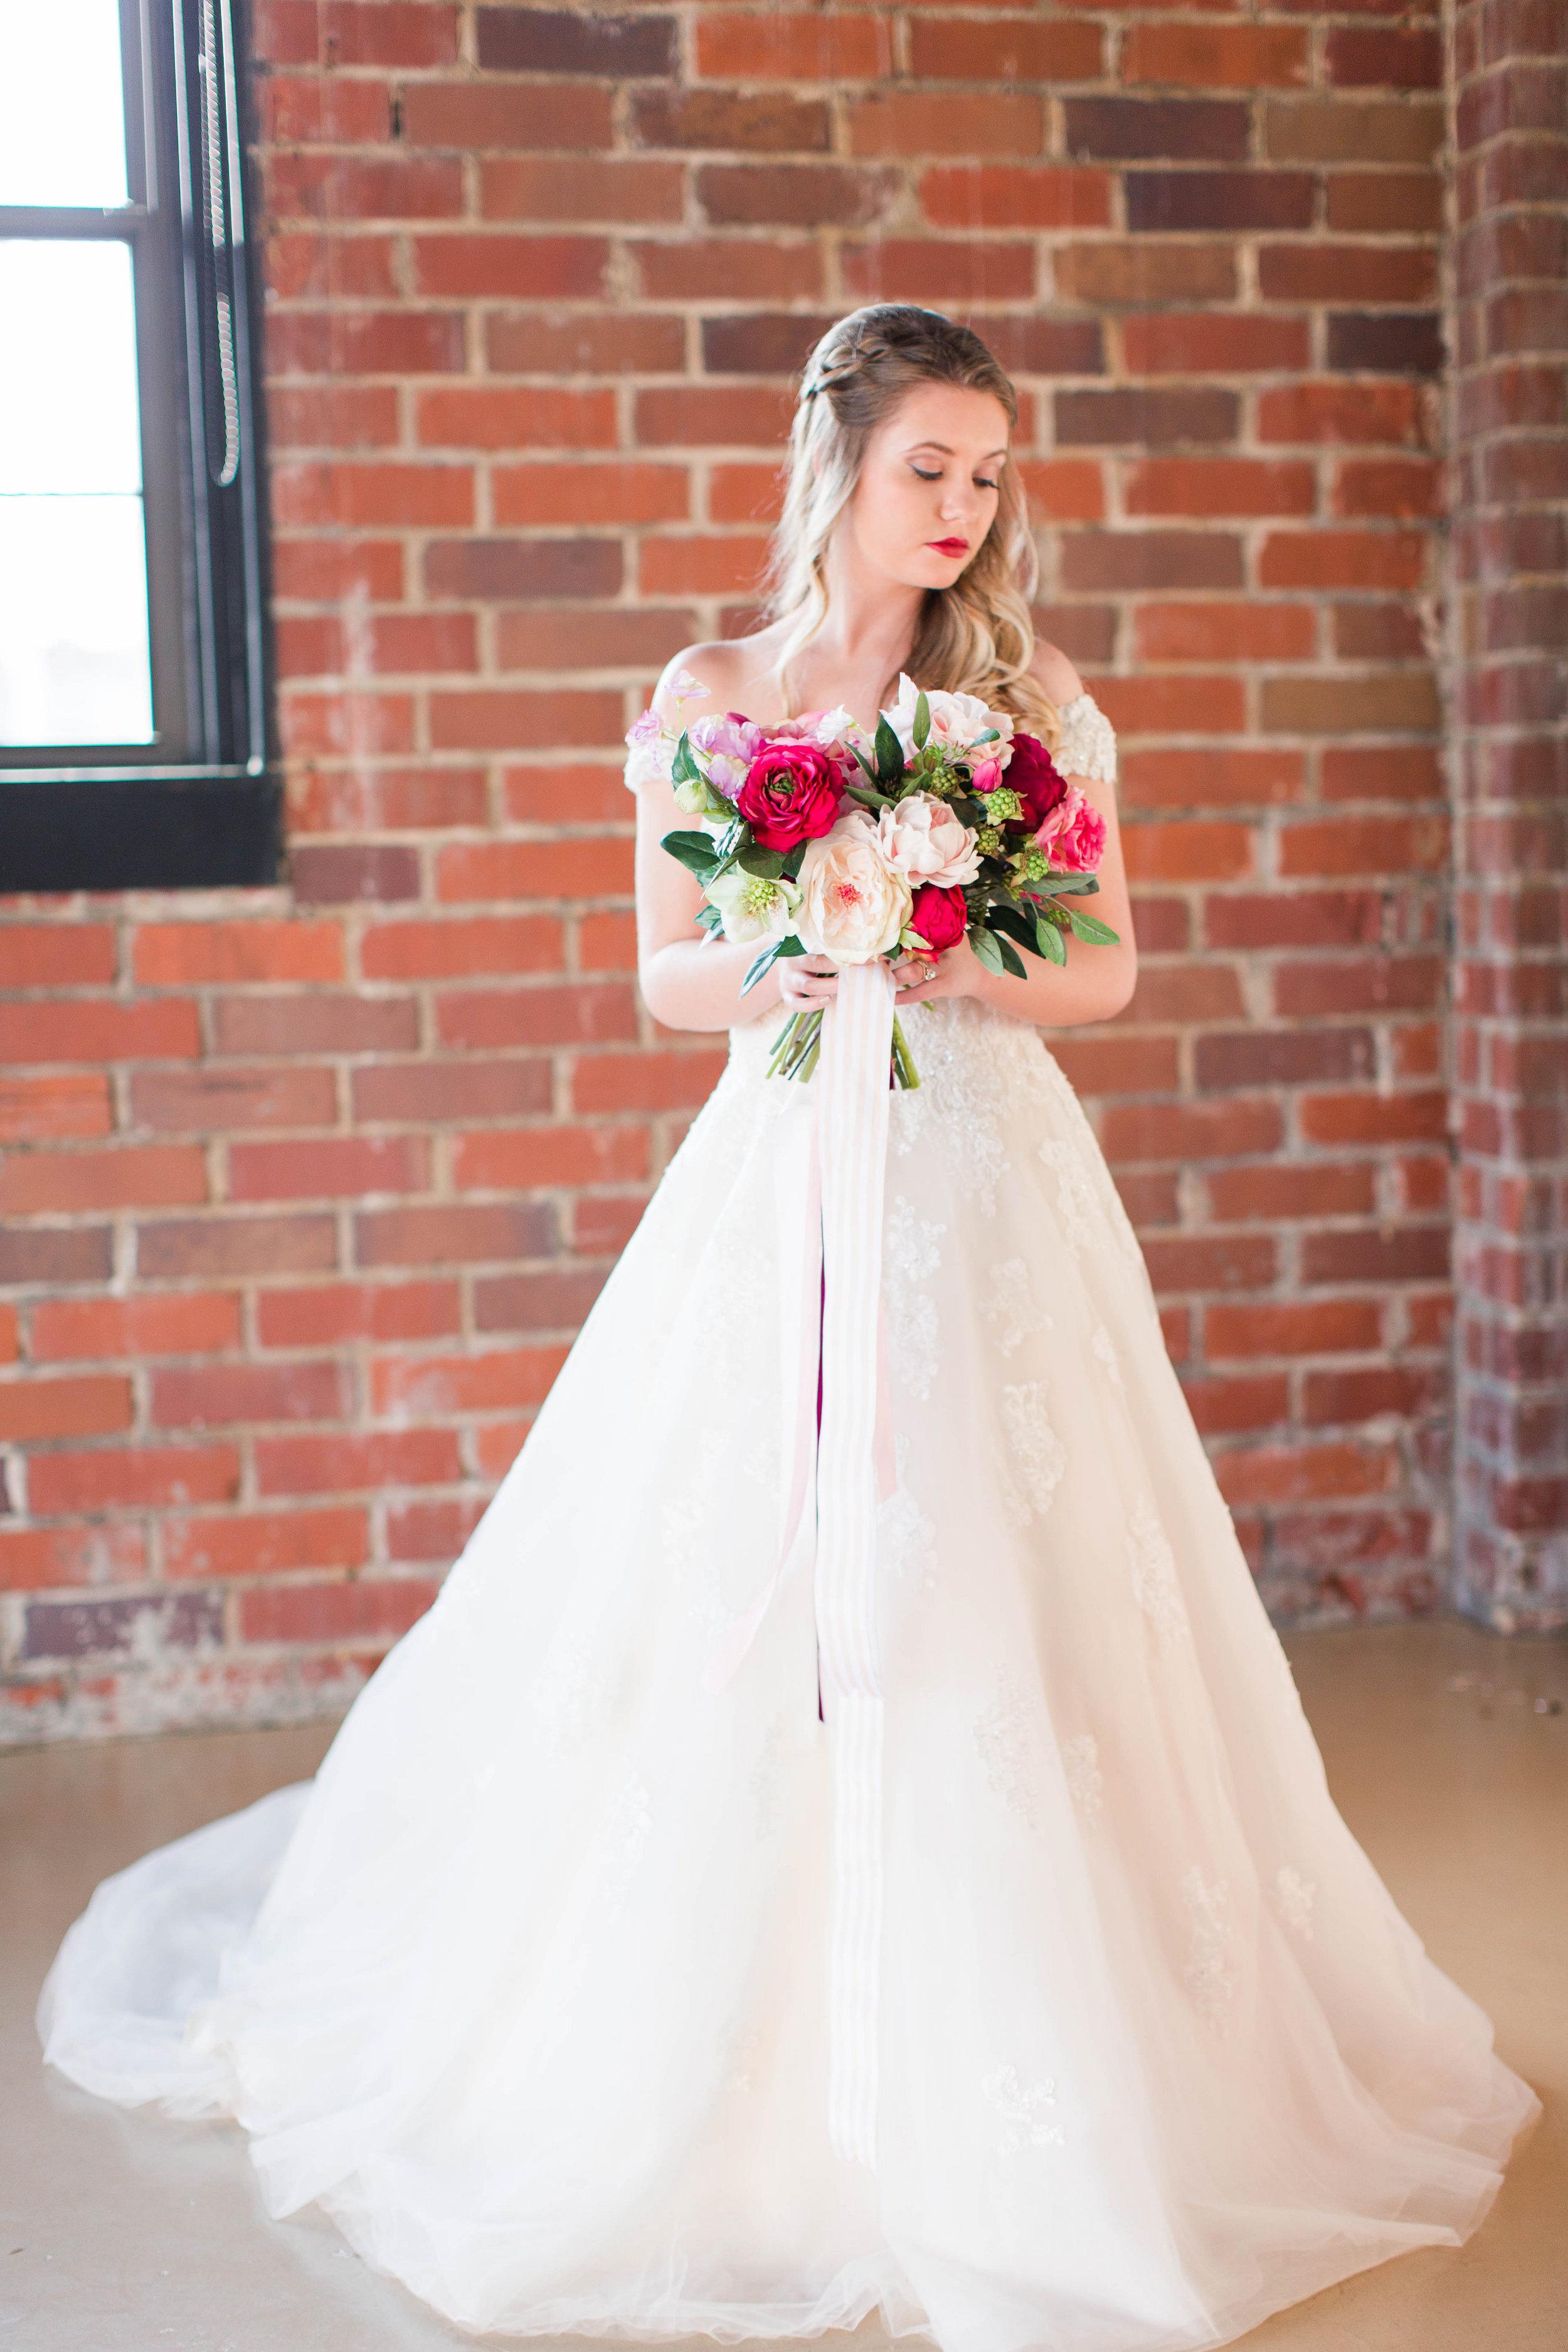 afloral-fake-flower-wedding-ivory-and-beau-bridal-boutique-maggie-sottero-saffron-the-hall-on-vine-wedding-statesboro-wedding-savannah-wedding-kristian-designs-rachel-strickland-photography-savannah-bridal-southern-bride-savannah-bride-2.jpg